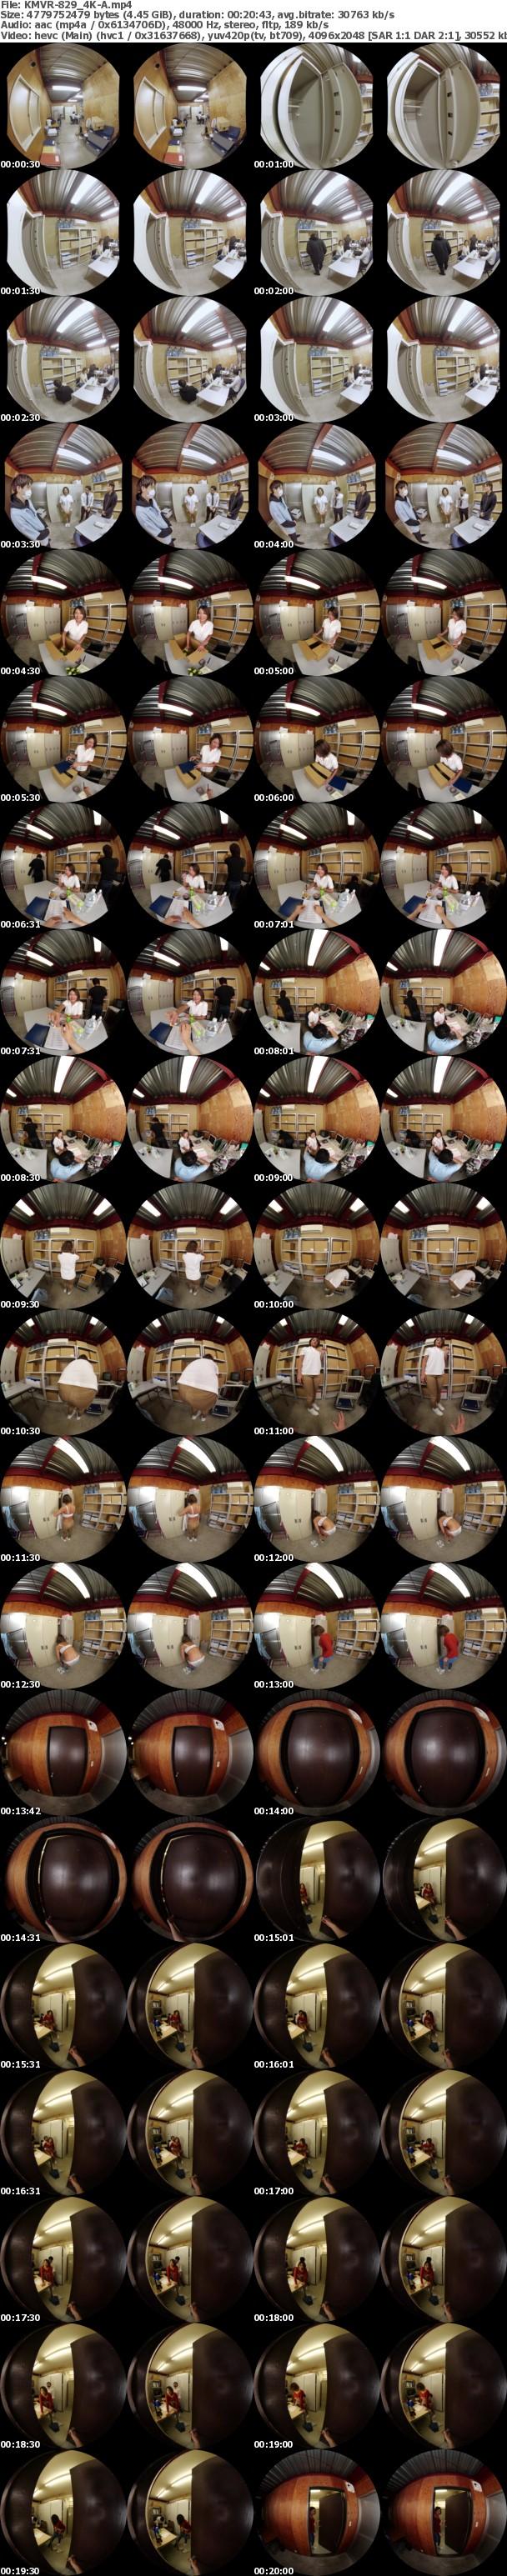 (VR) (4K) KMVR-829 男を喰い物にする痴女バイター かほさん(22歳)Gcup 趣味SEX 今井夏帆